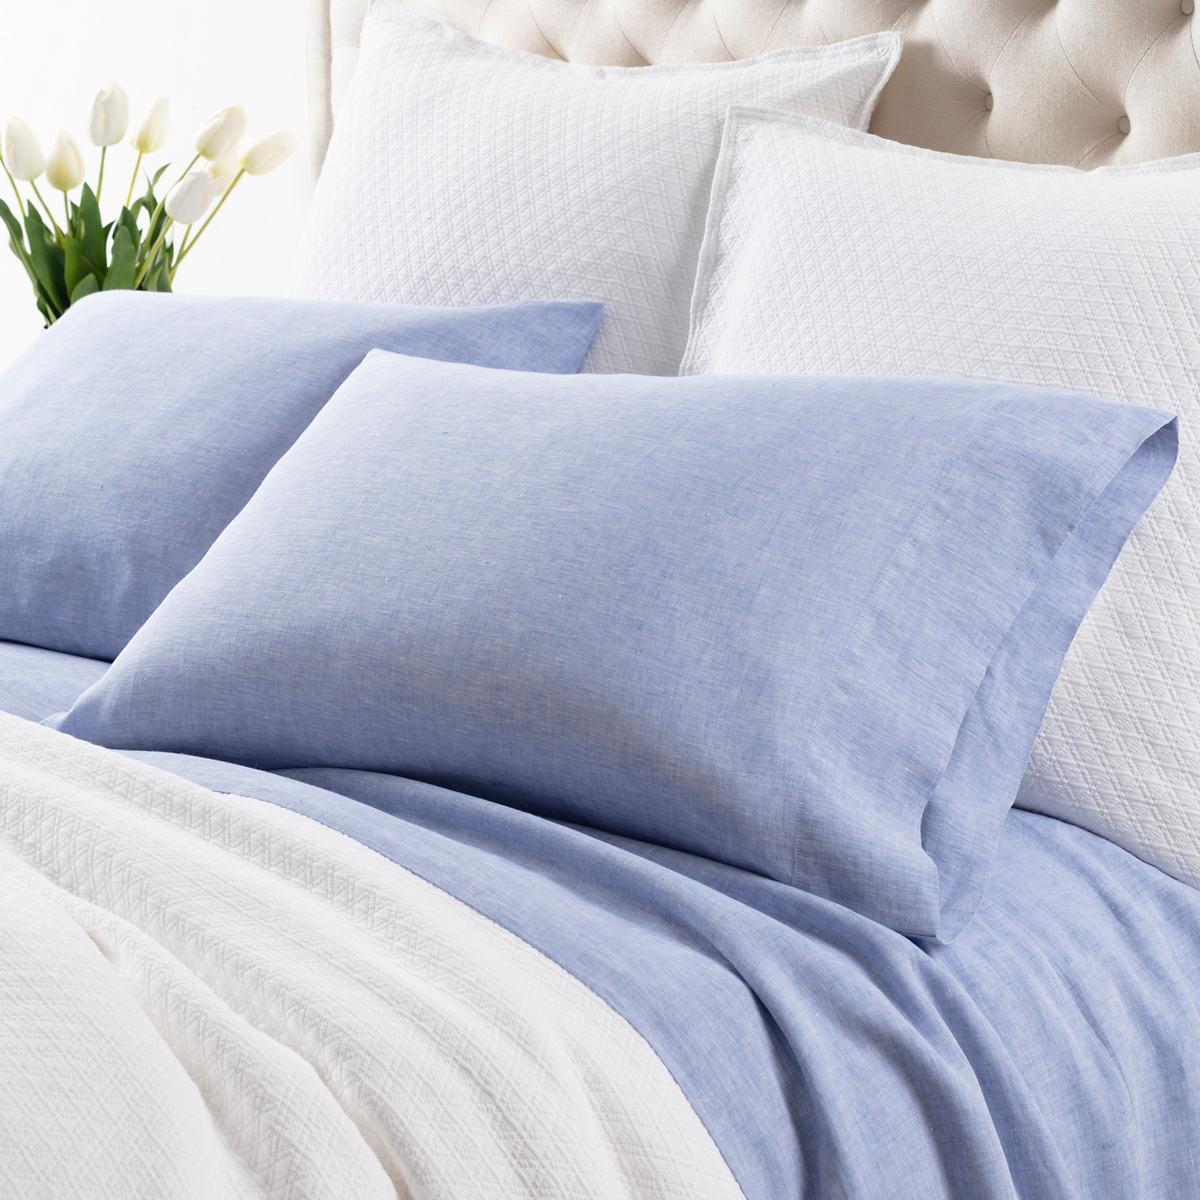 Lush Linen French Blue Sheet Set